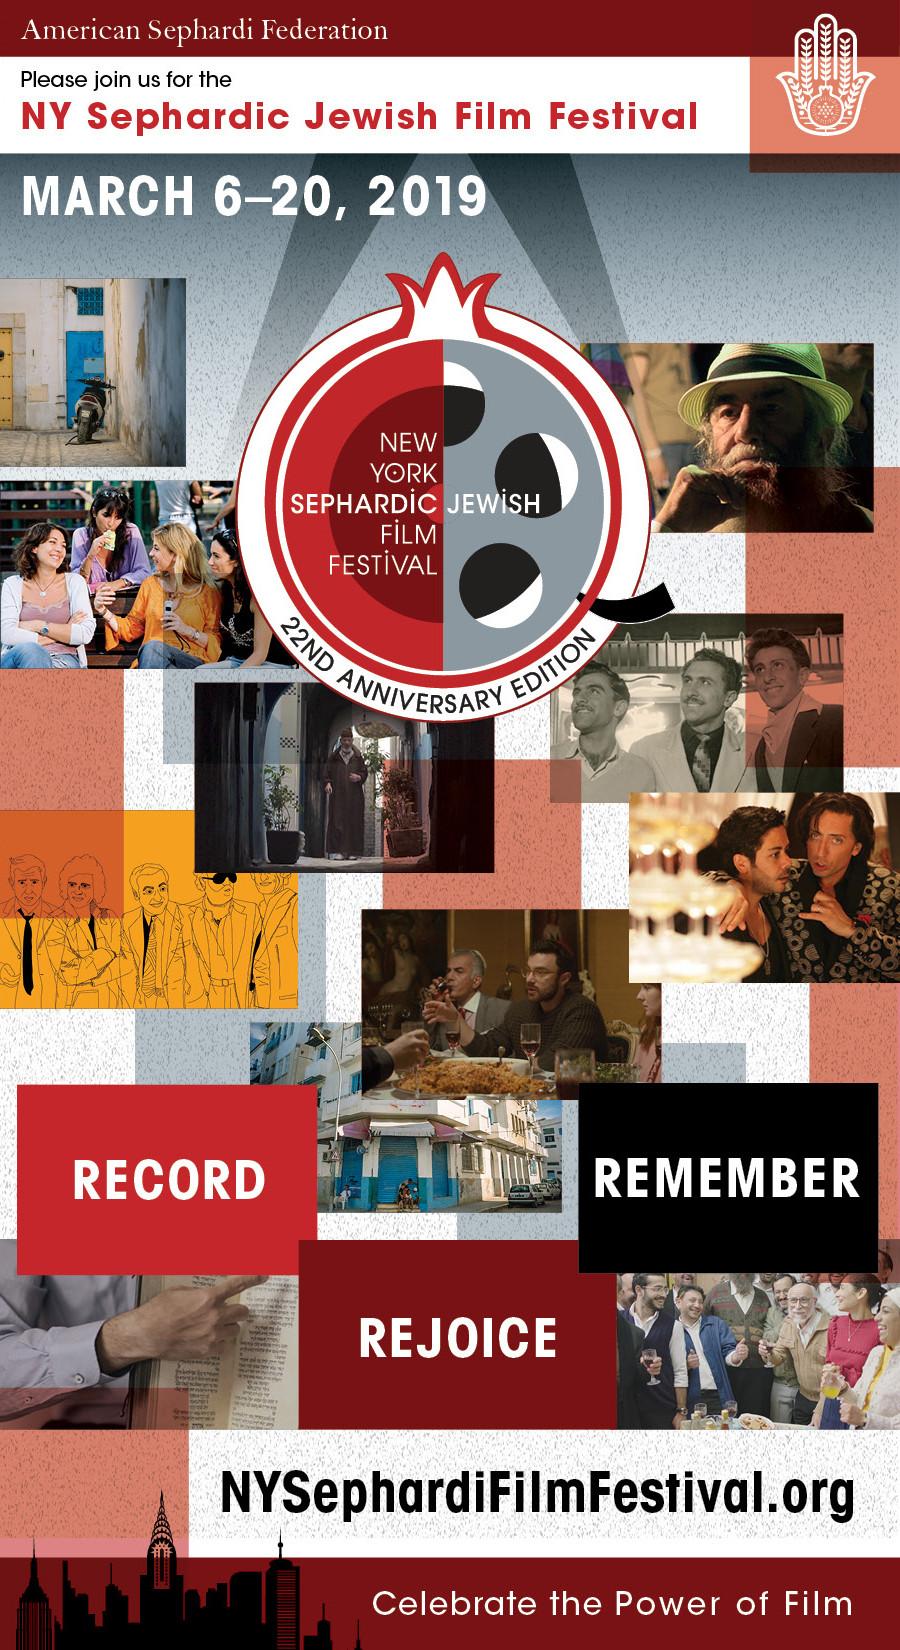 NY Sephardic Jewish Film Festival 2019